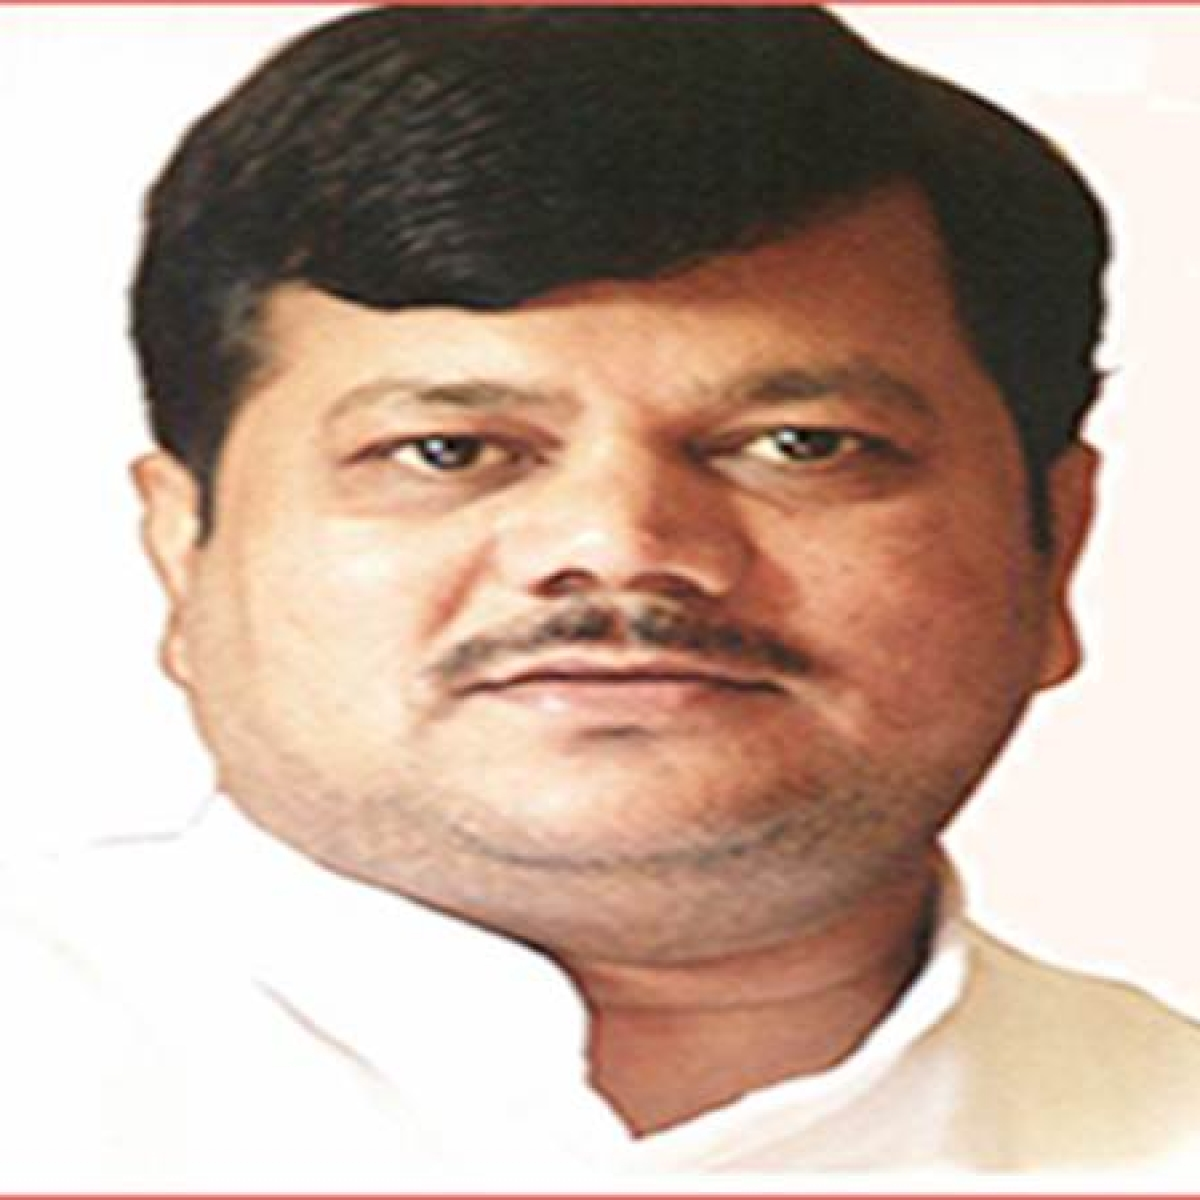 Coronavirus in Mumbai: Govt failed to handle crisis, says BJP leader Pravin Darekar on visit to Mira Bhayandar Municipal Corporation